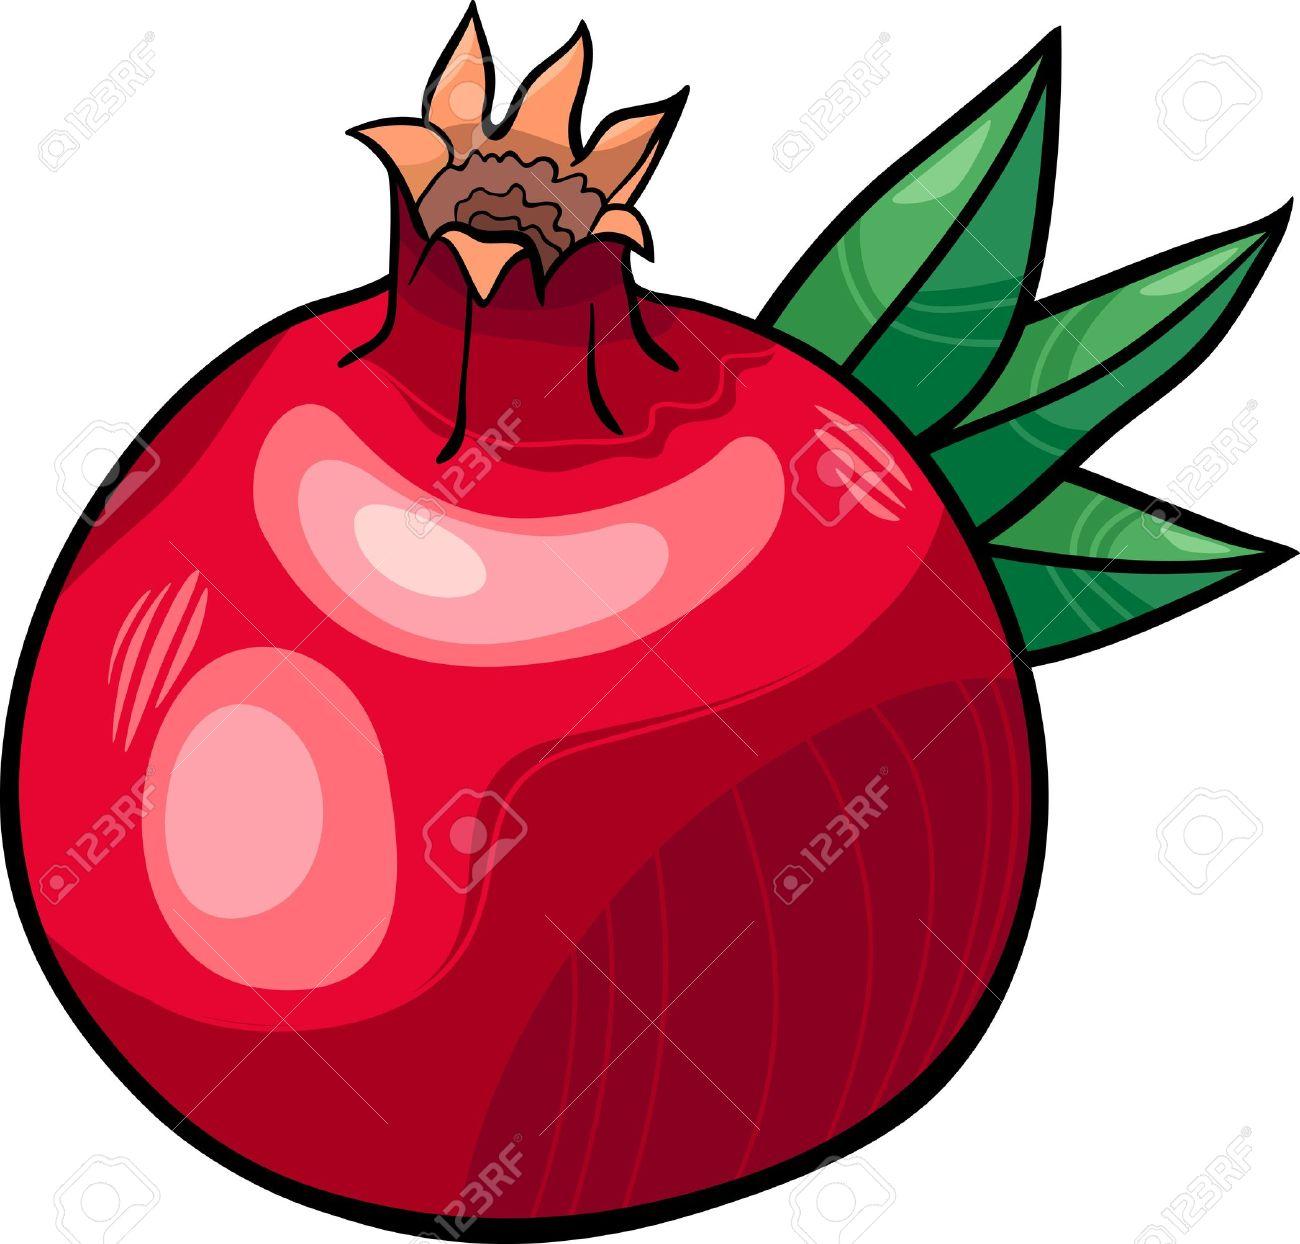 pomegranate clip art: Cartoon .